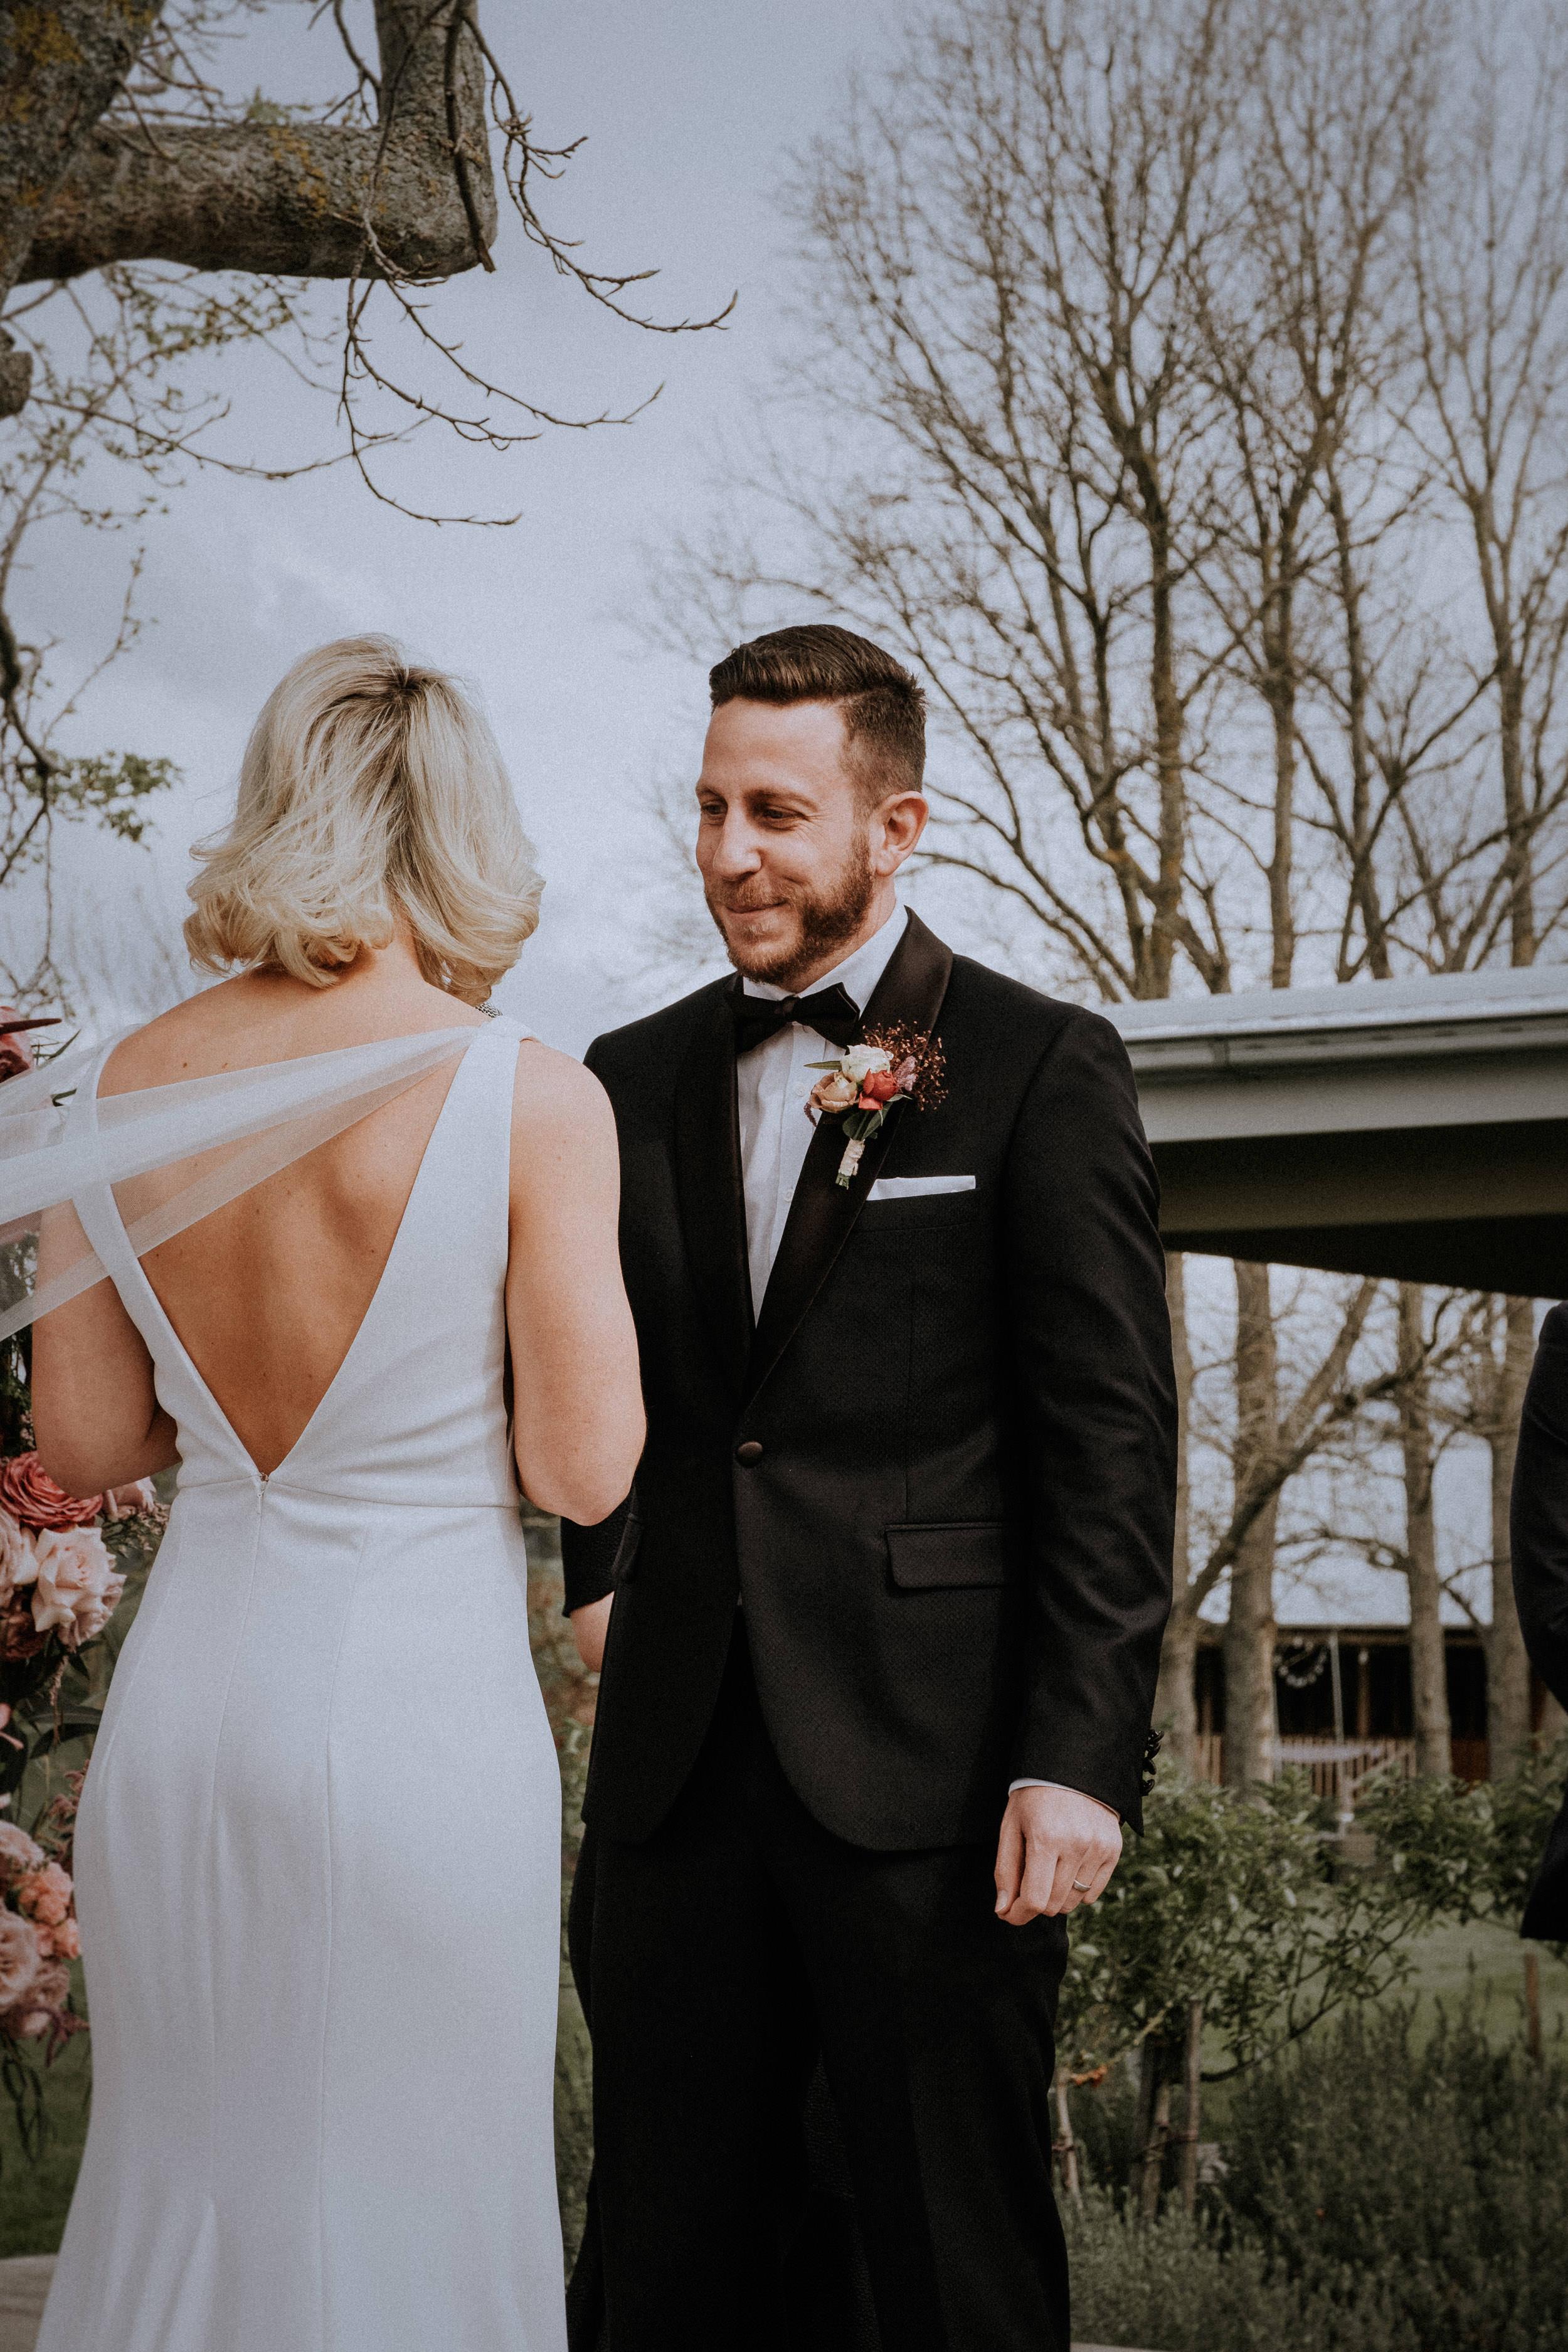 Sydney & Blue Mountains Elopement & Wedding Photography. Destination wedding photographers. Vegan weddings. Emotional and Non-Traditional wedding photography.